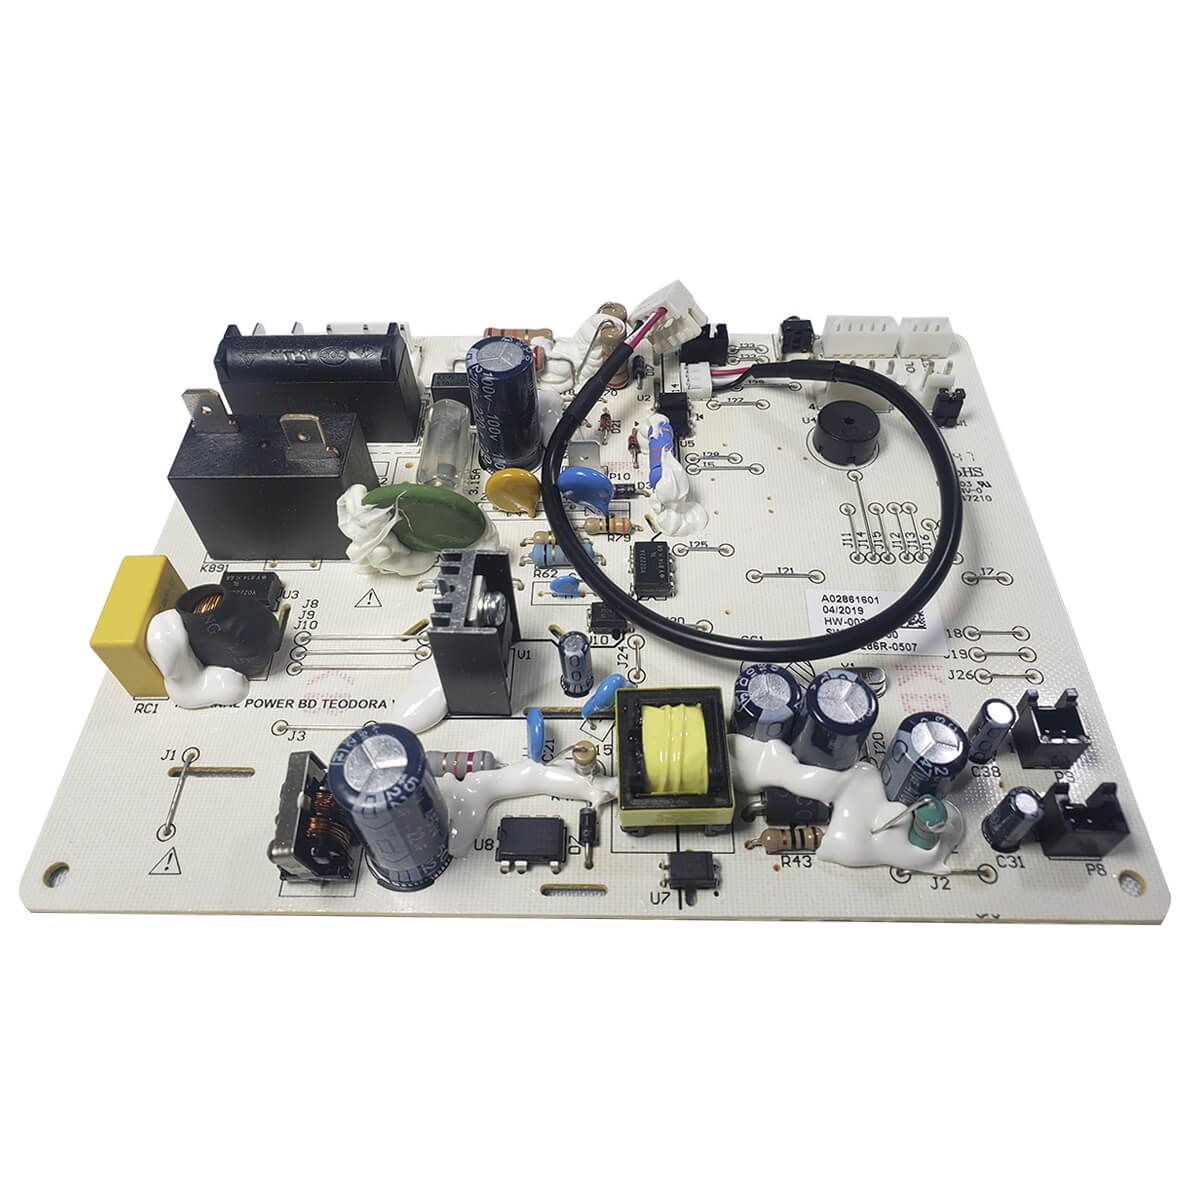 Placa Unidade Interna Do Ar Condicionado Split Inverter Electrolux QI09R QI12R QI09F QI12F - A02861601